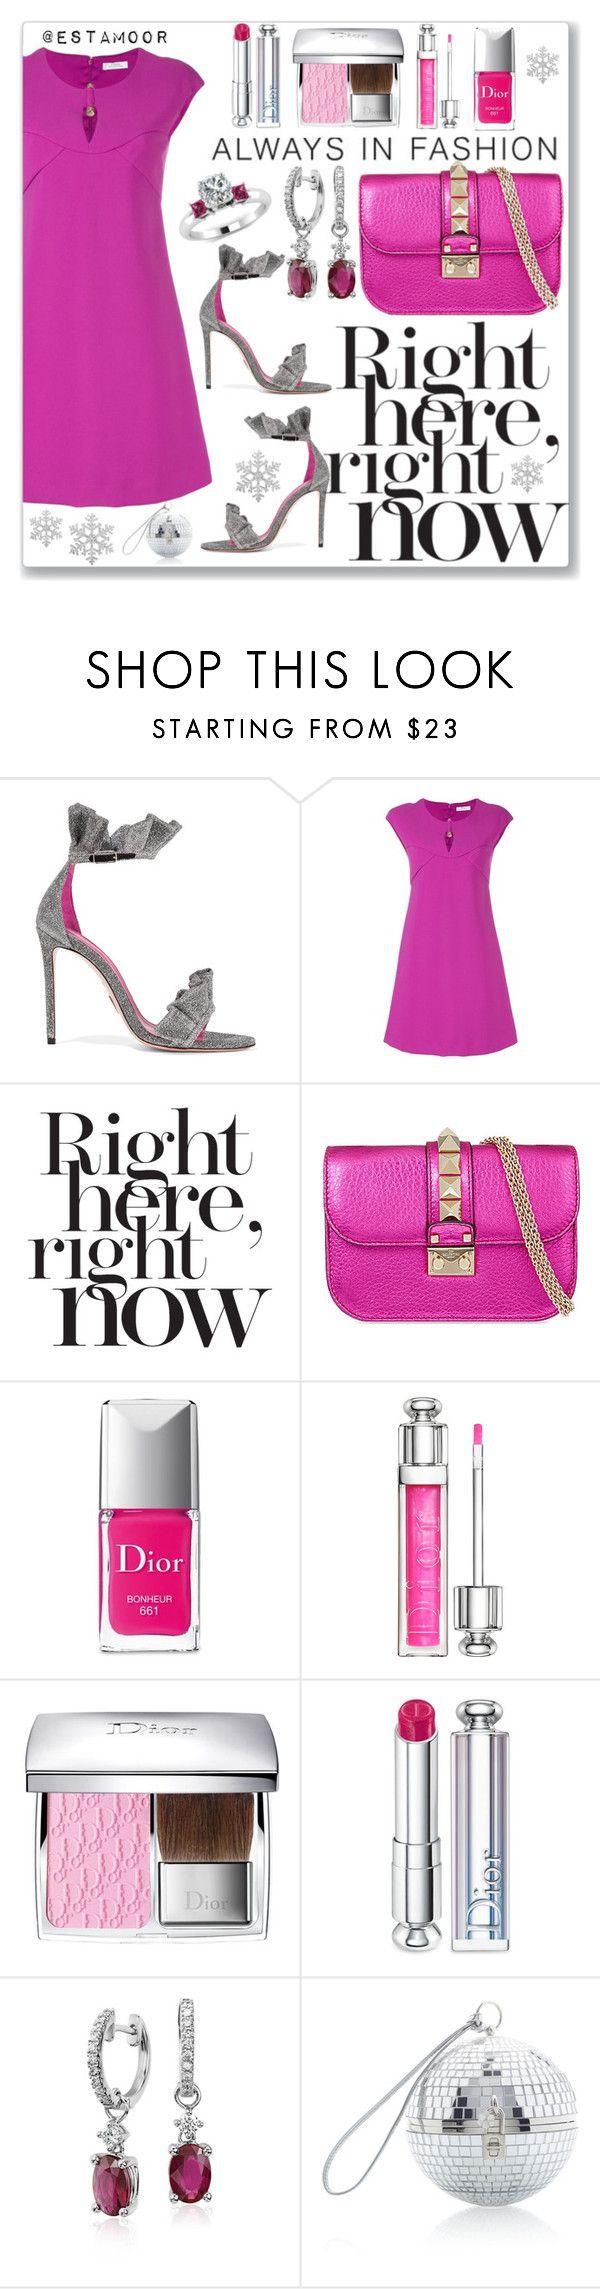 """Без названия #182"" by estamoor on Polyvore featuring мода, Oscar Tiye, Versace, Christian Dior, Blue Nile, Dolce&Gabbana и Shishi"